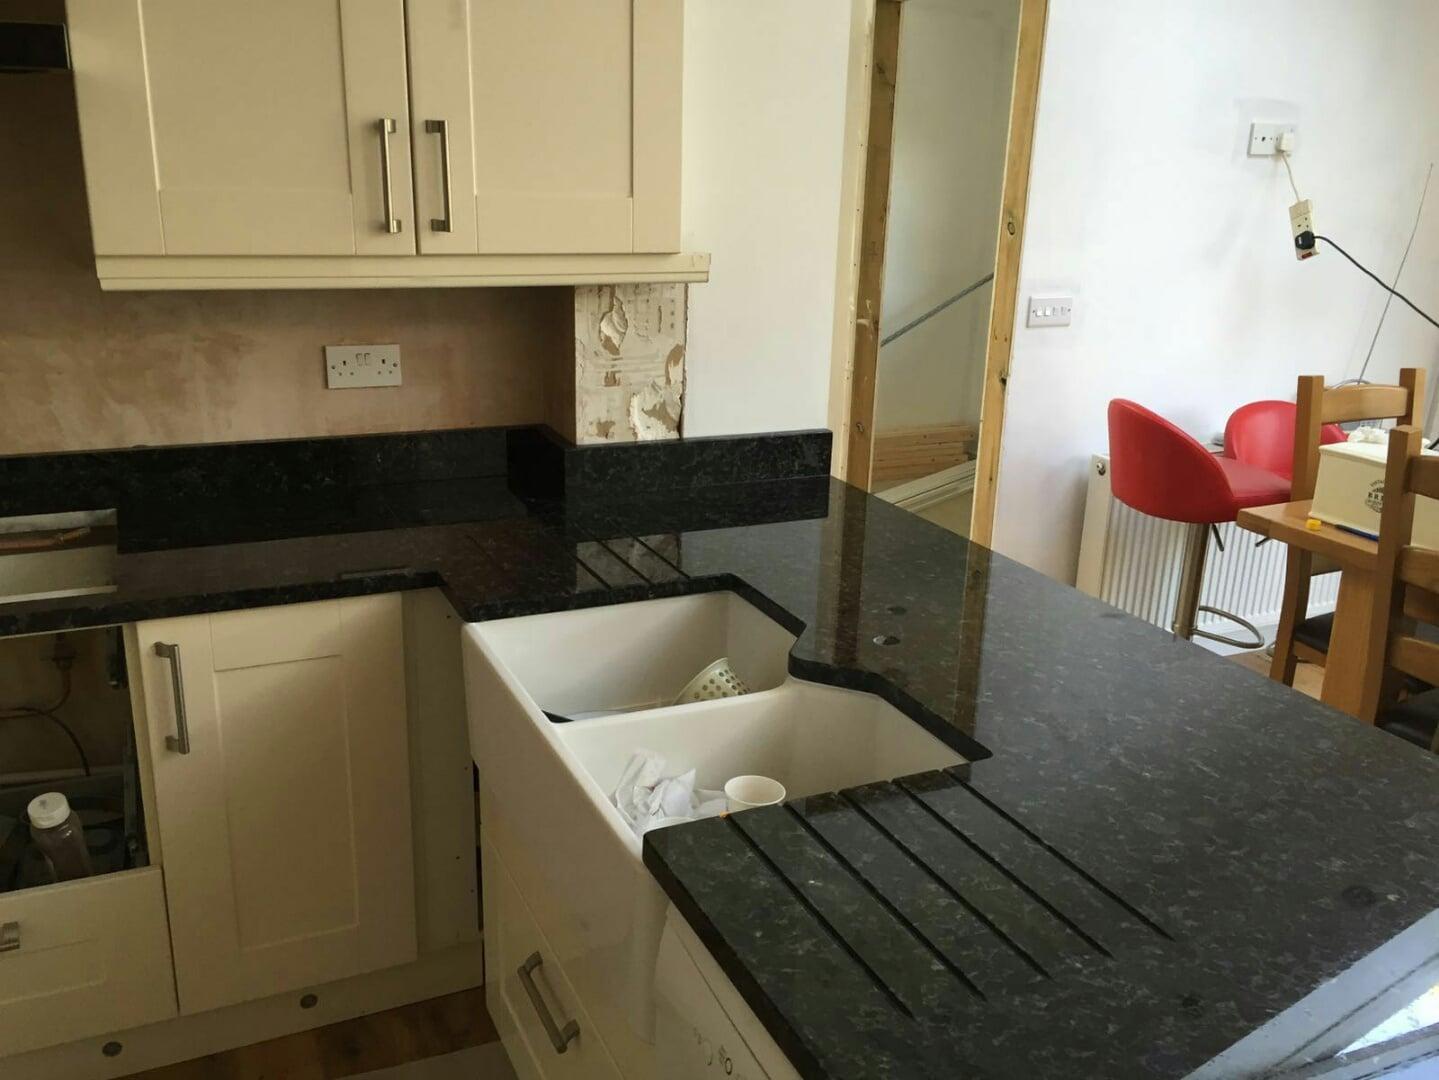 Kitchen sink with matching black glass tap landing and sliding cover - Volga Blue Granite Worktops